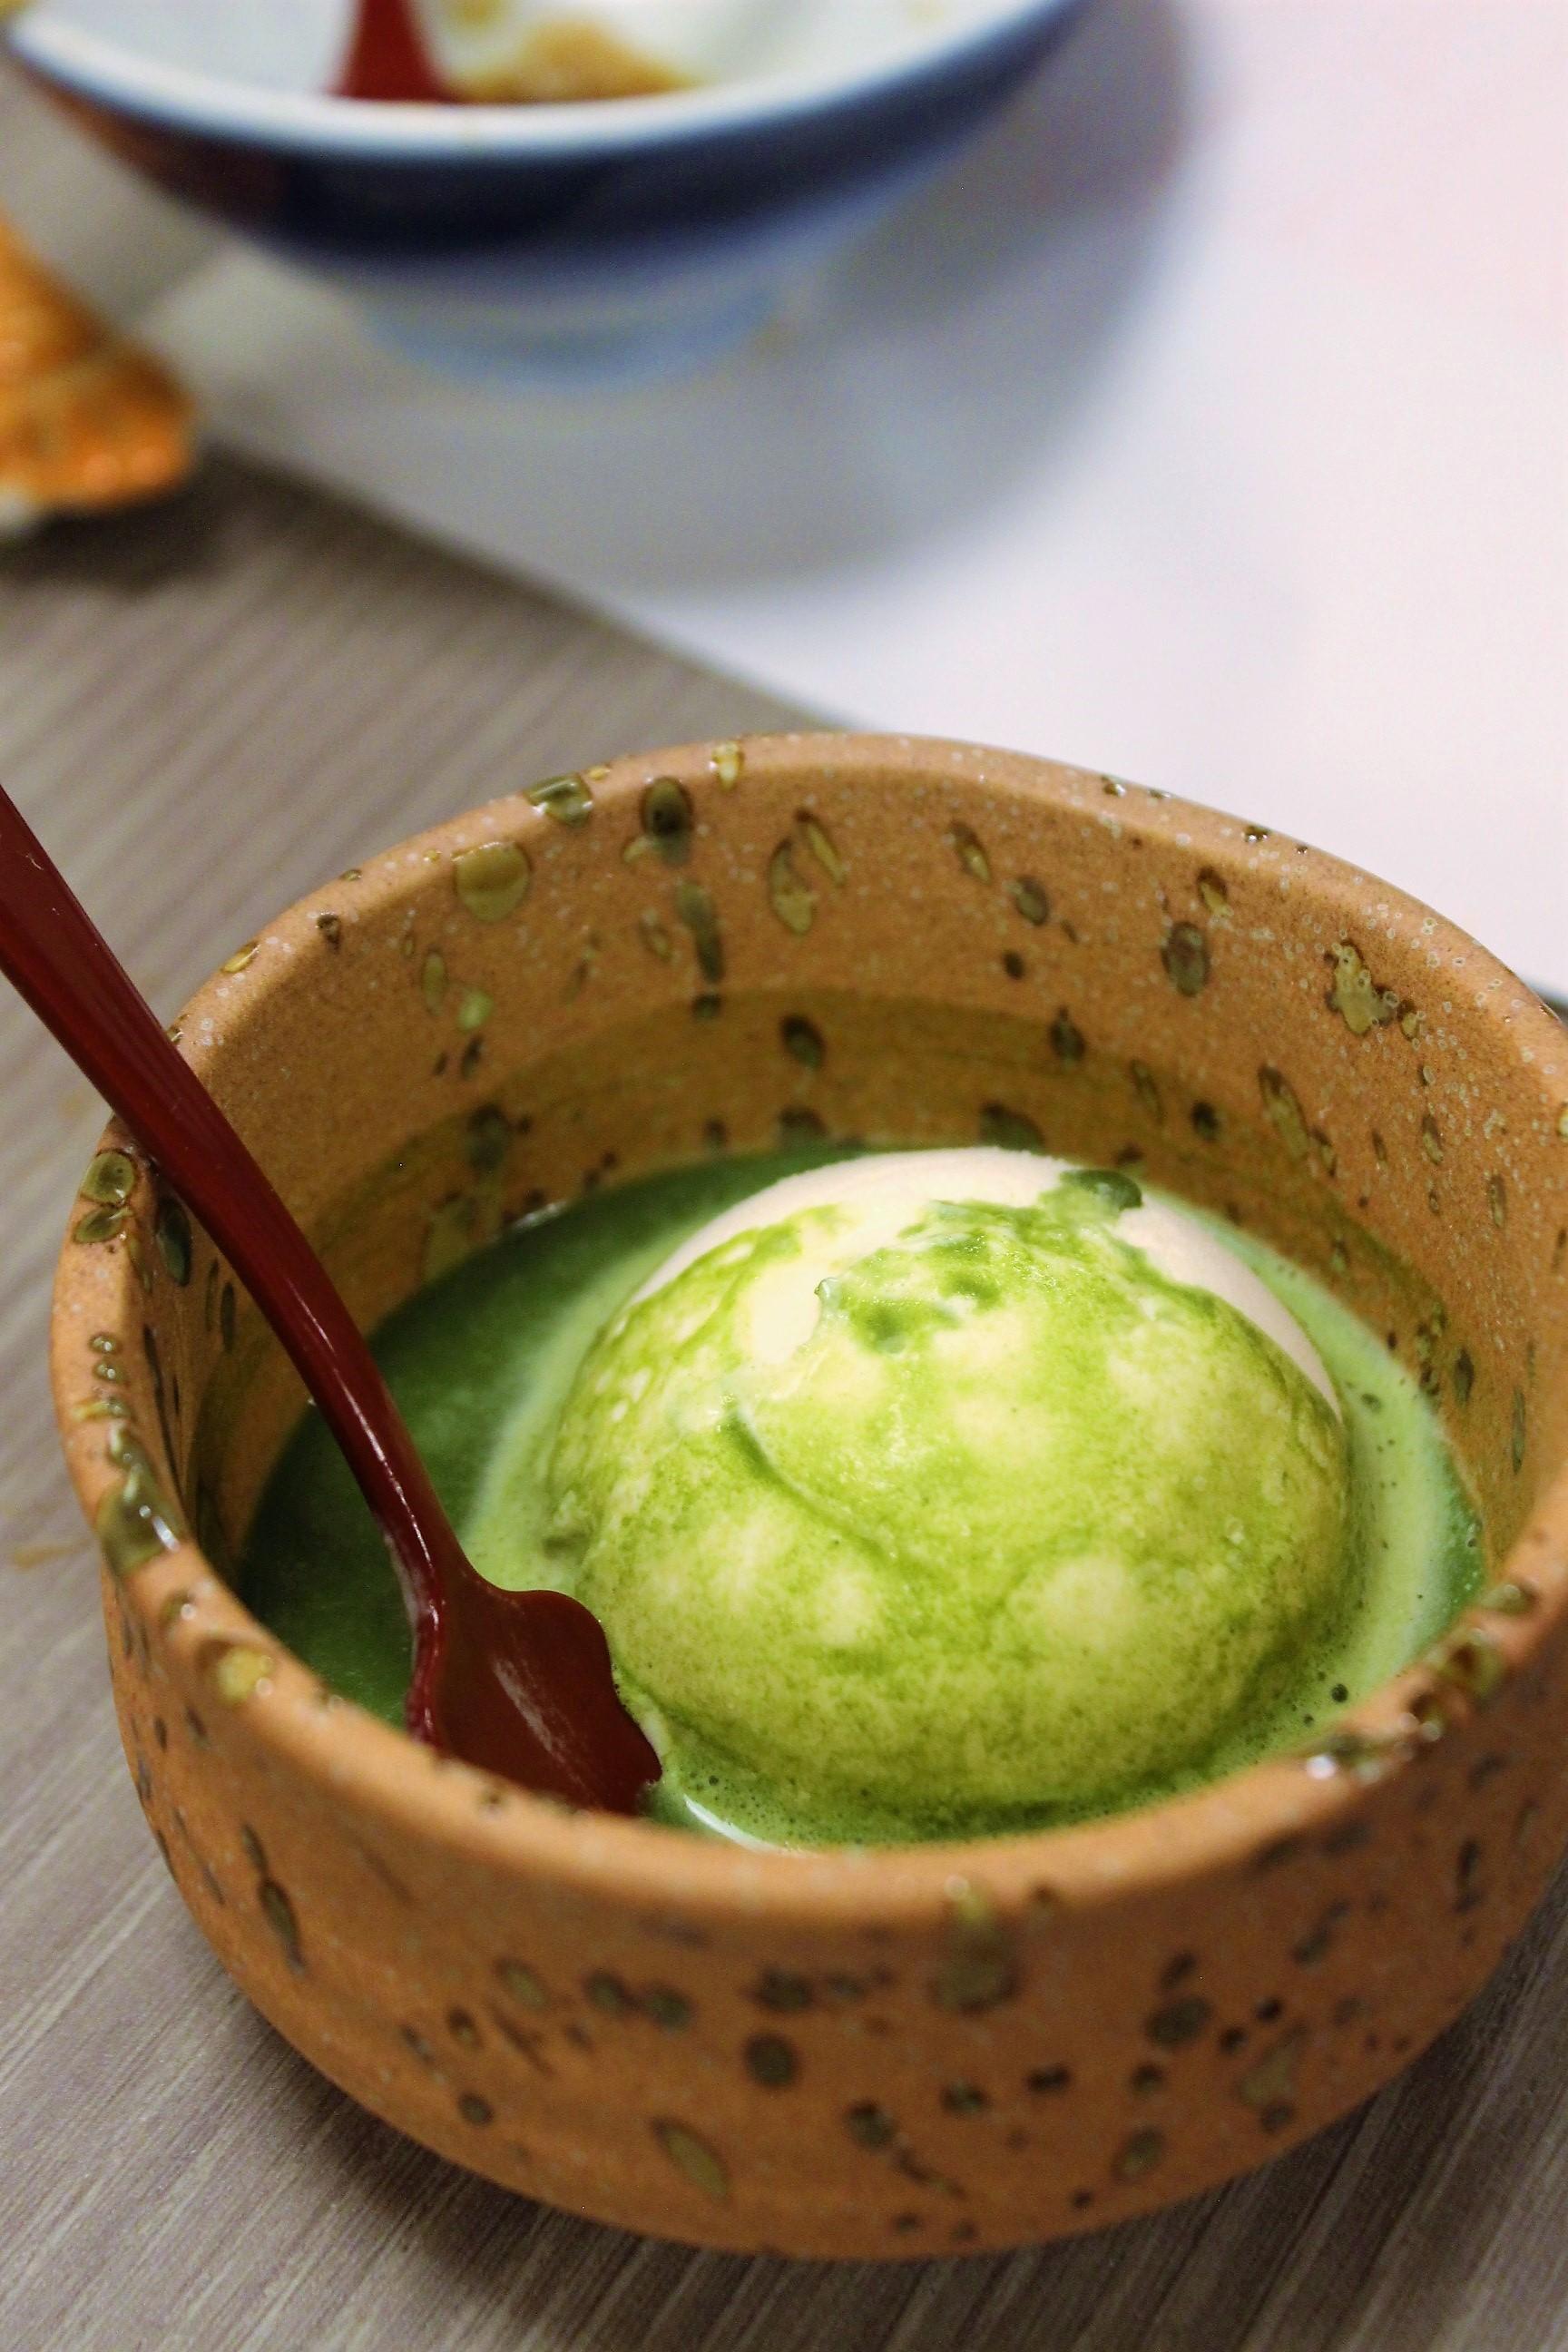 Ice Cream with Matcha